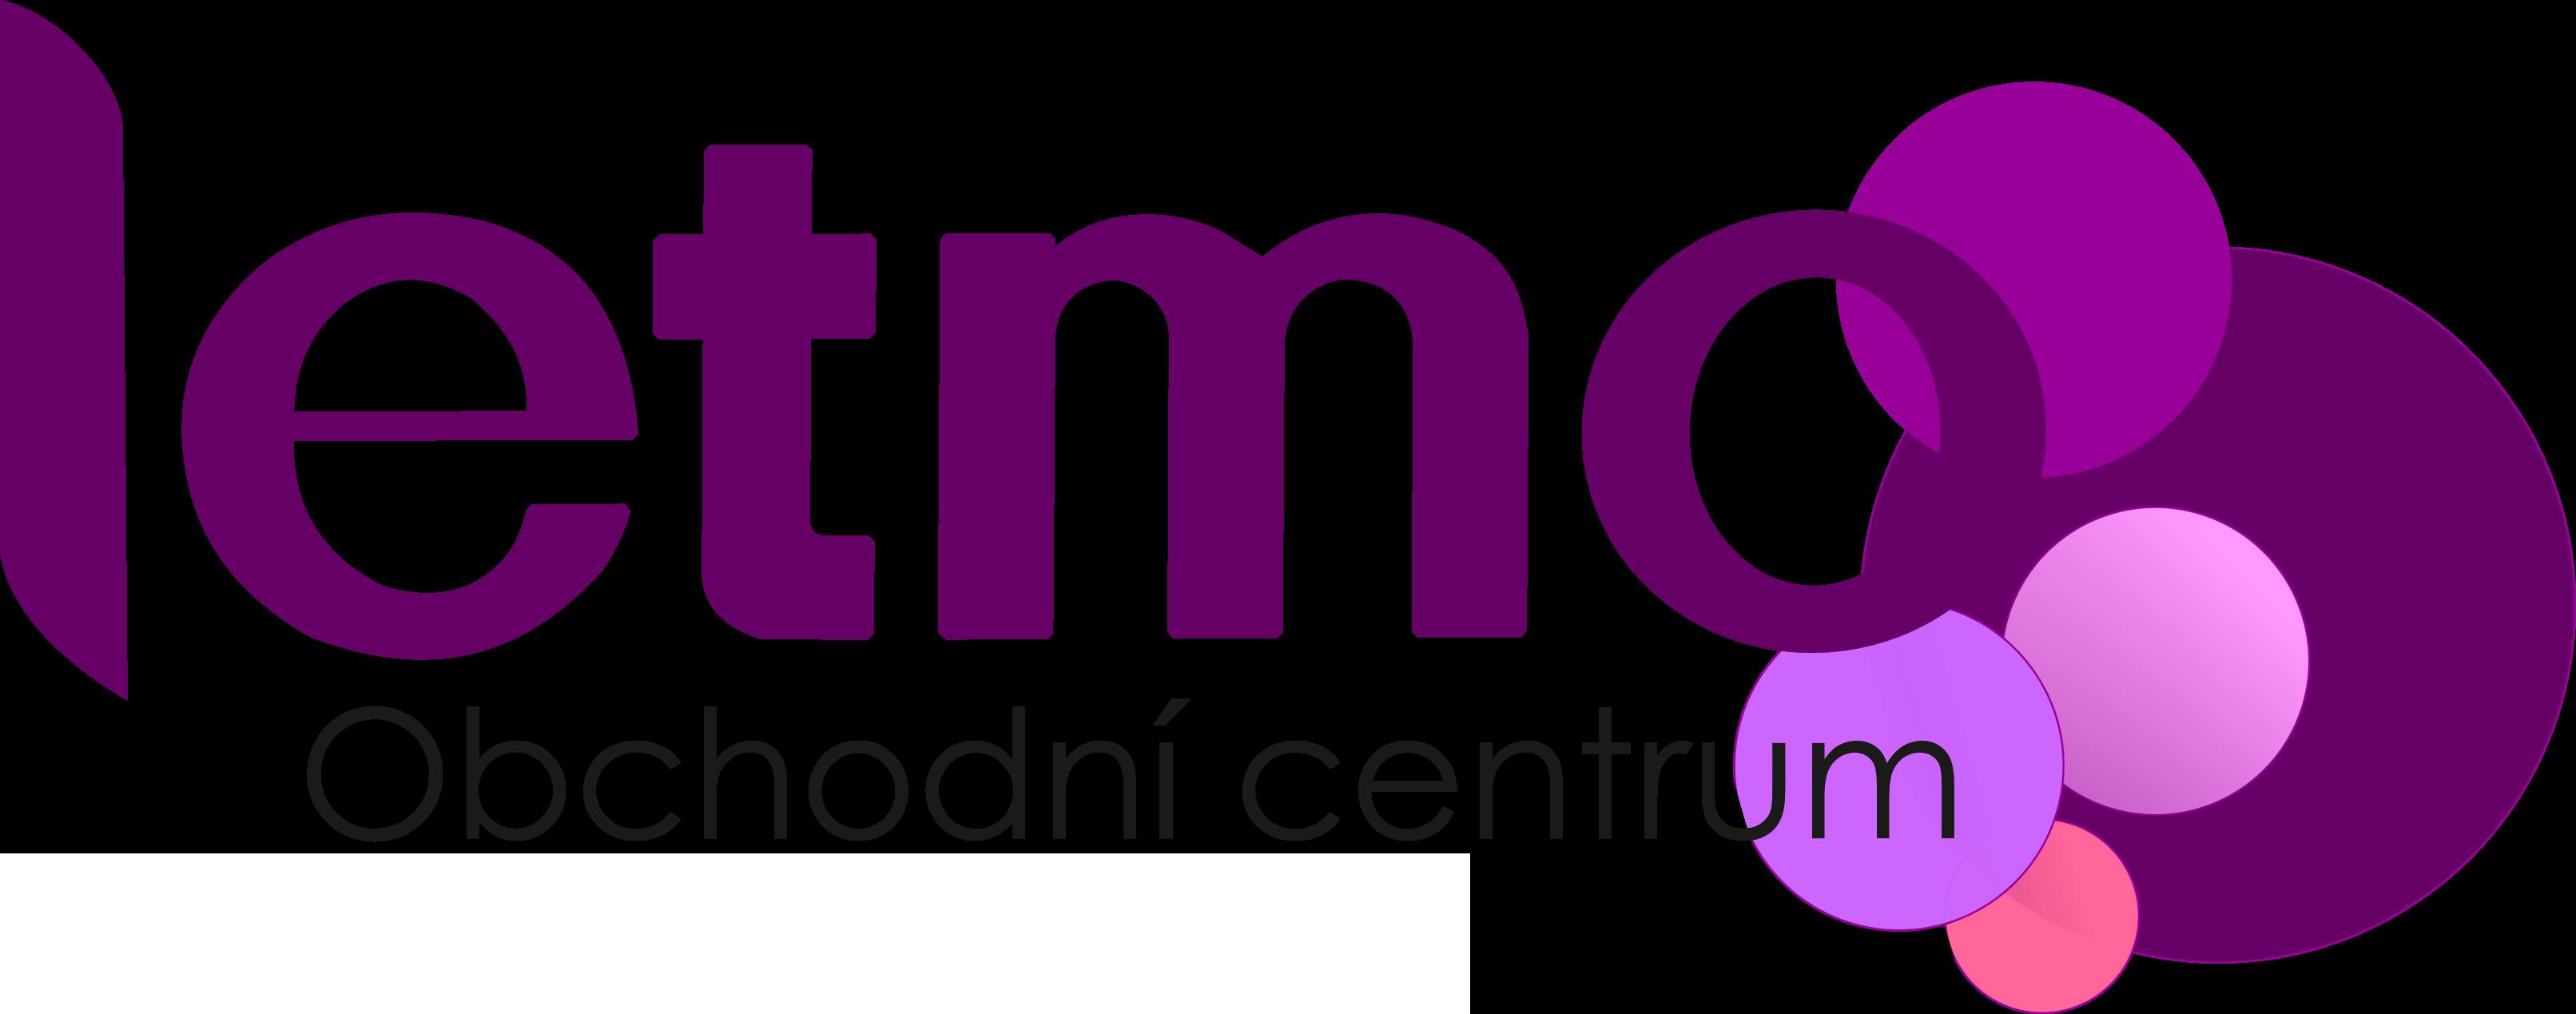 Obchodni Centrum Oc Letmo